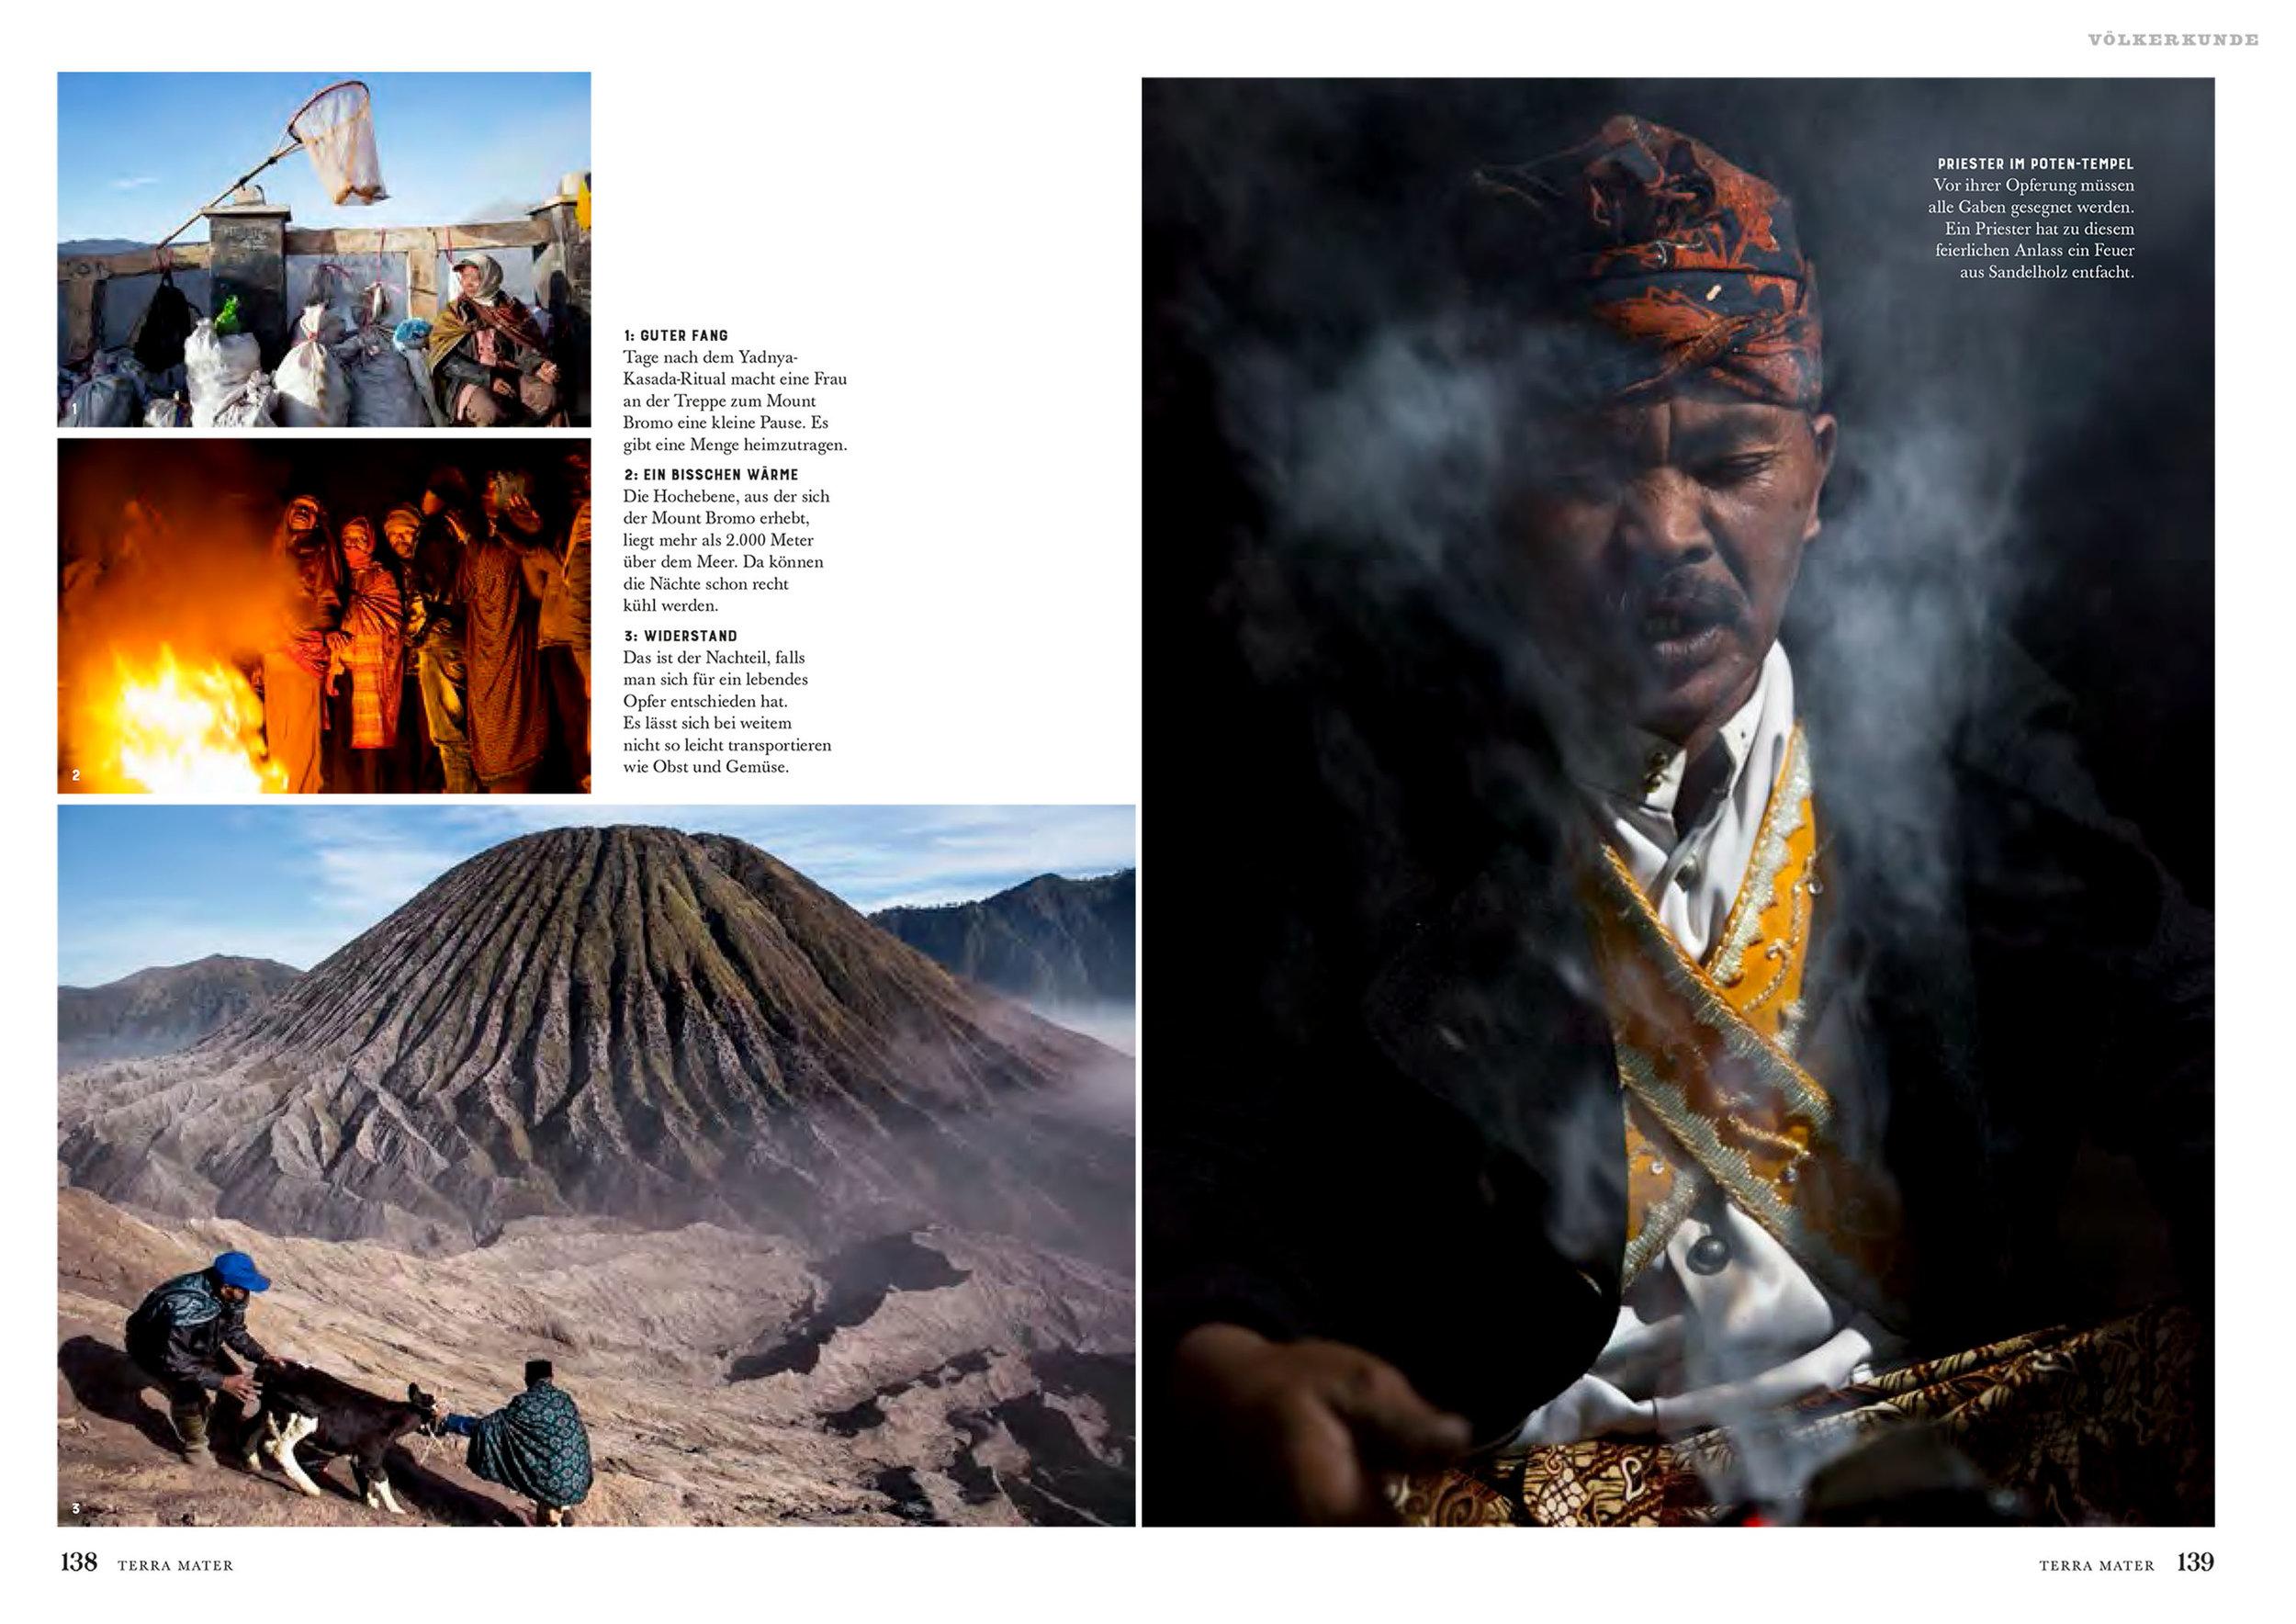 Terra Matter Magazine, 2016.